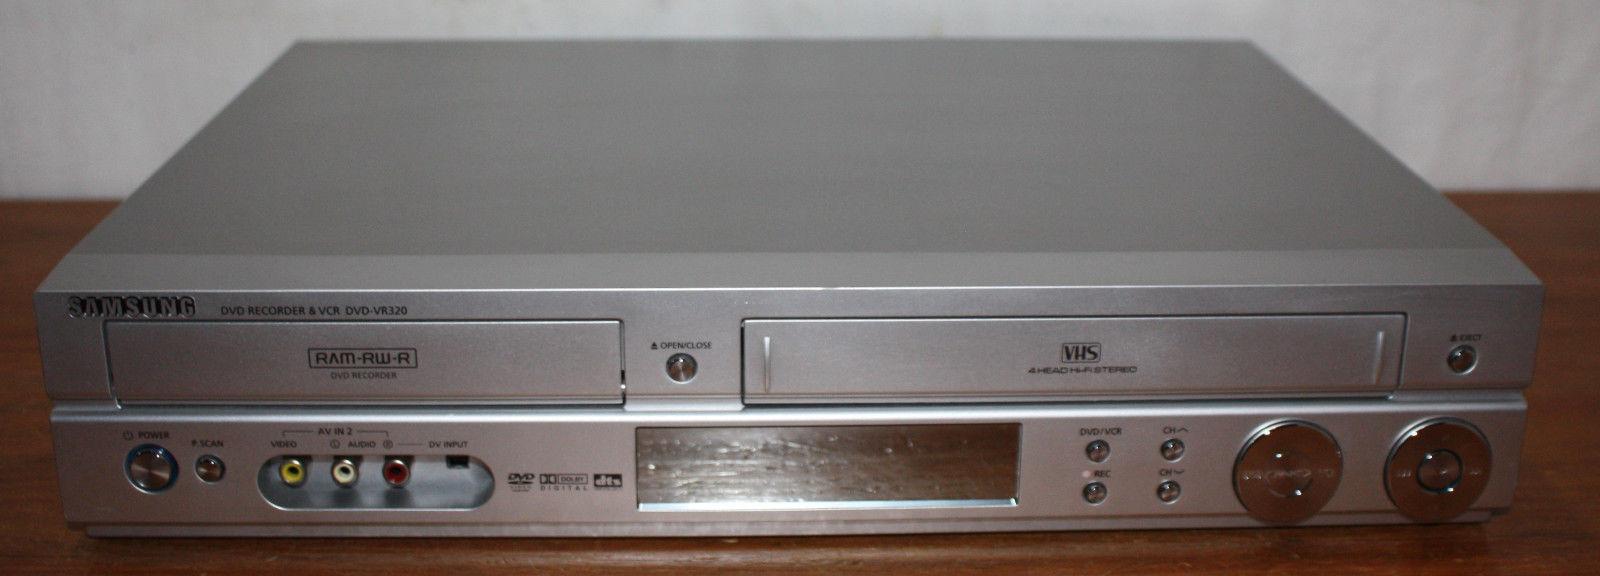 BROKEN - Samsung Combo VCR & DVD Recorder DVD-VR320, VHS Tape Player